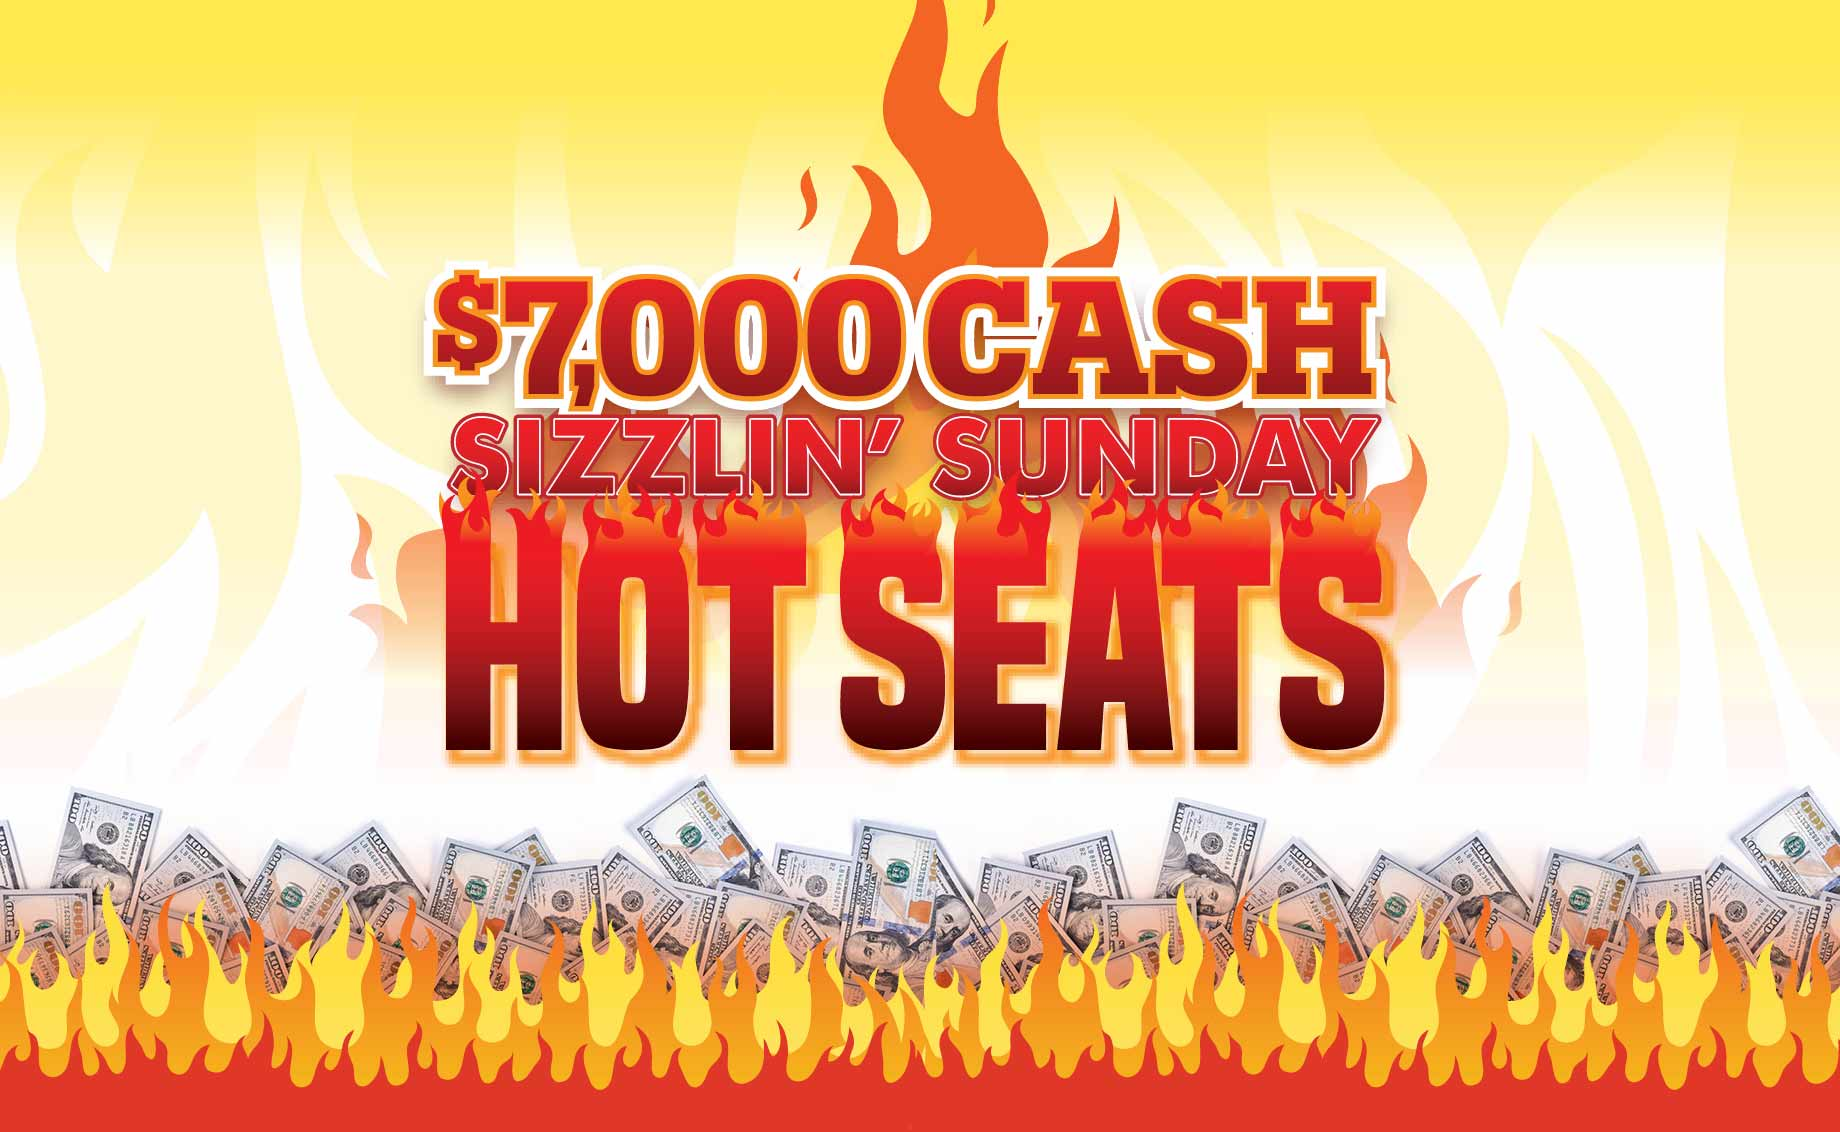 $7,000 Cash Sizzlin' Sunday Hot Seats